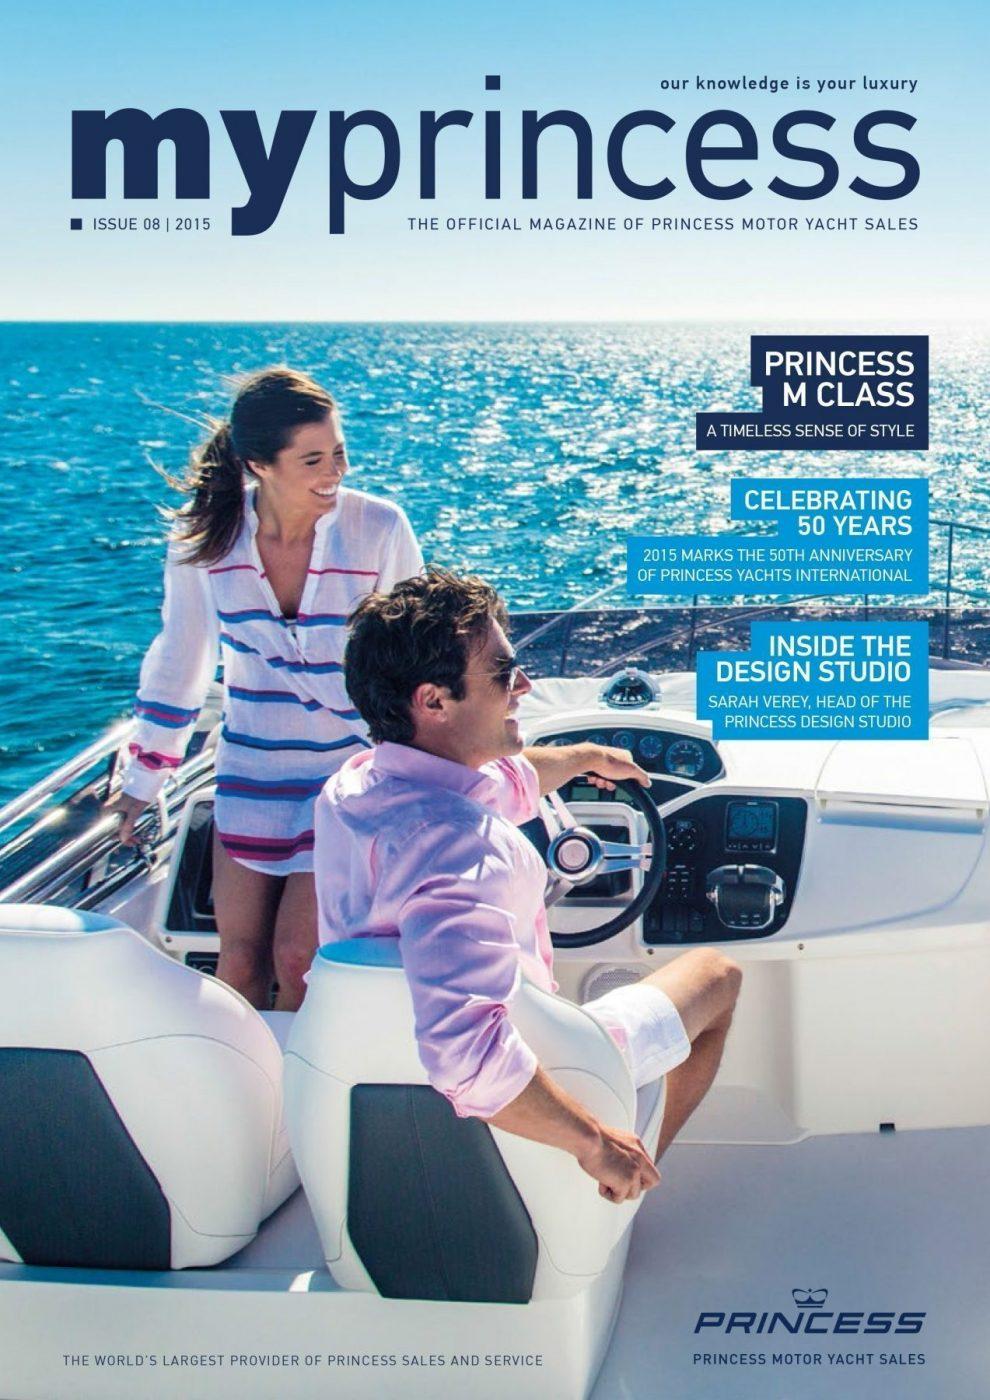 Princess Motor Yacht Sales - My Princess Cover 2015